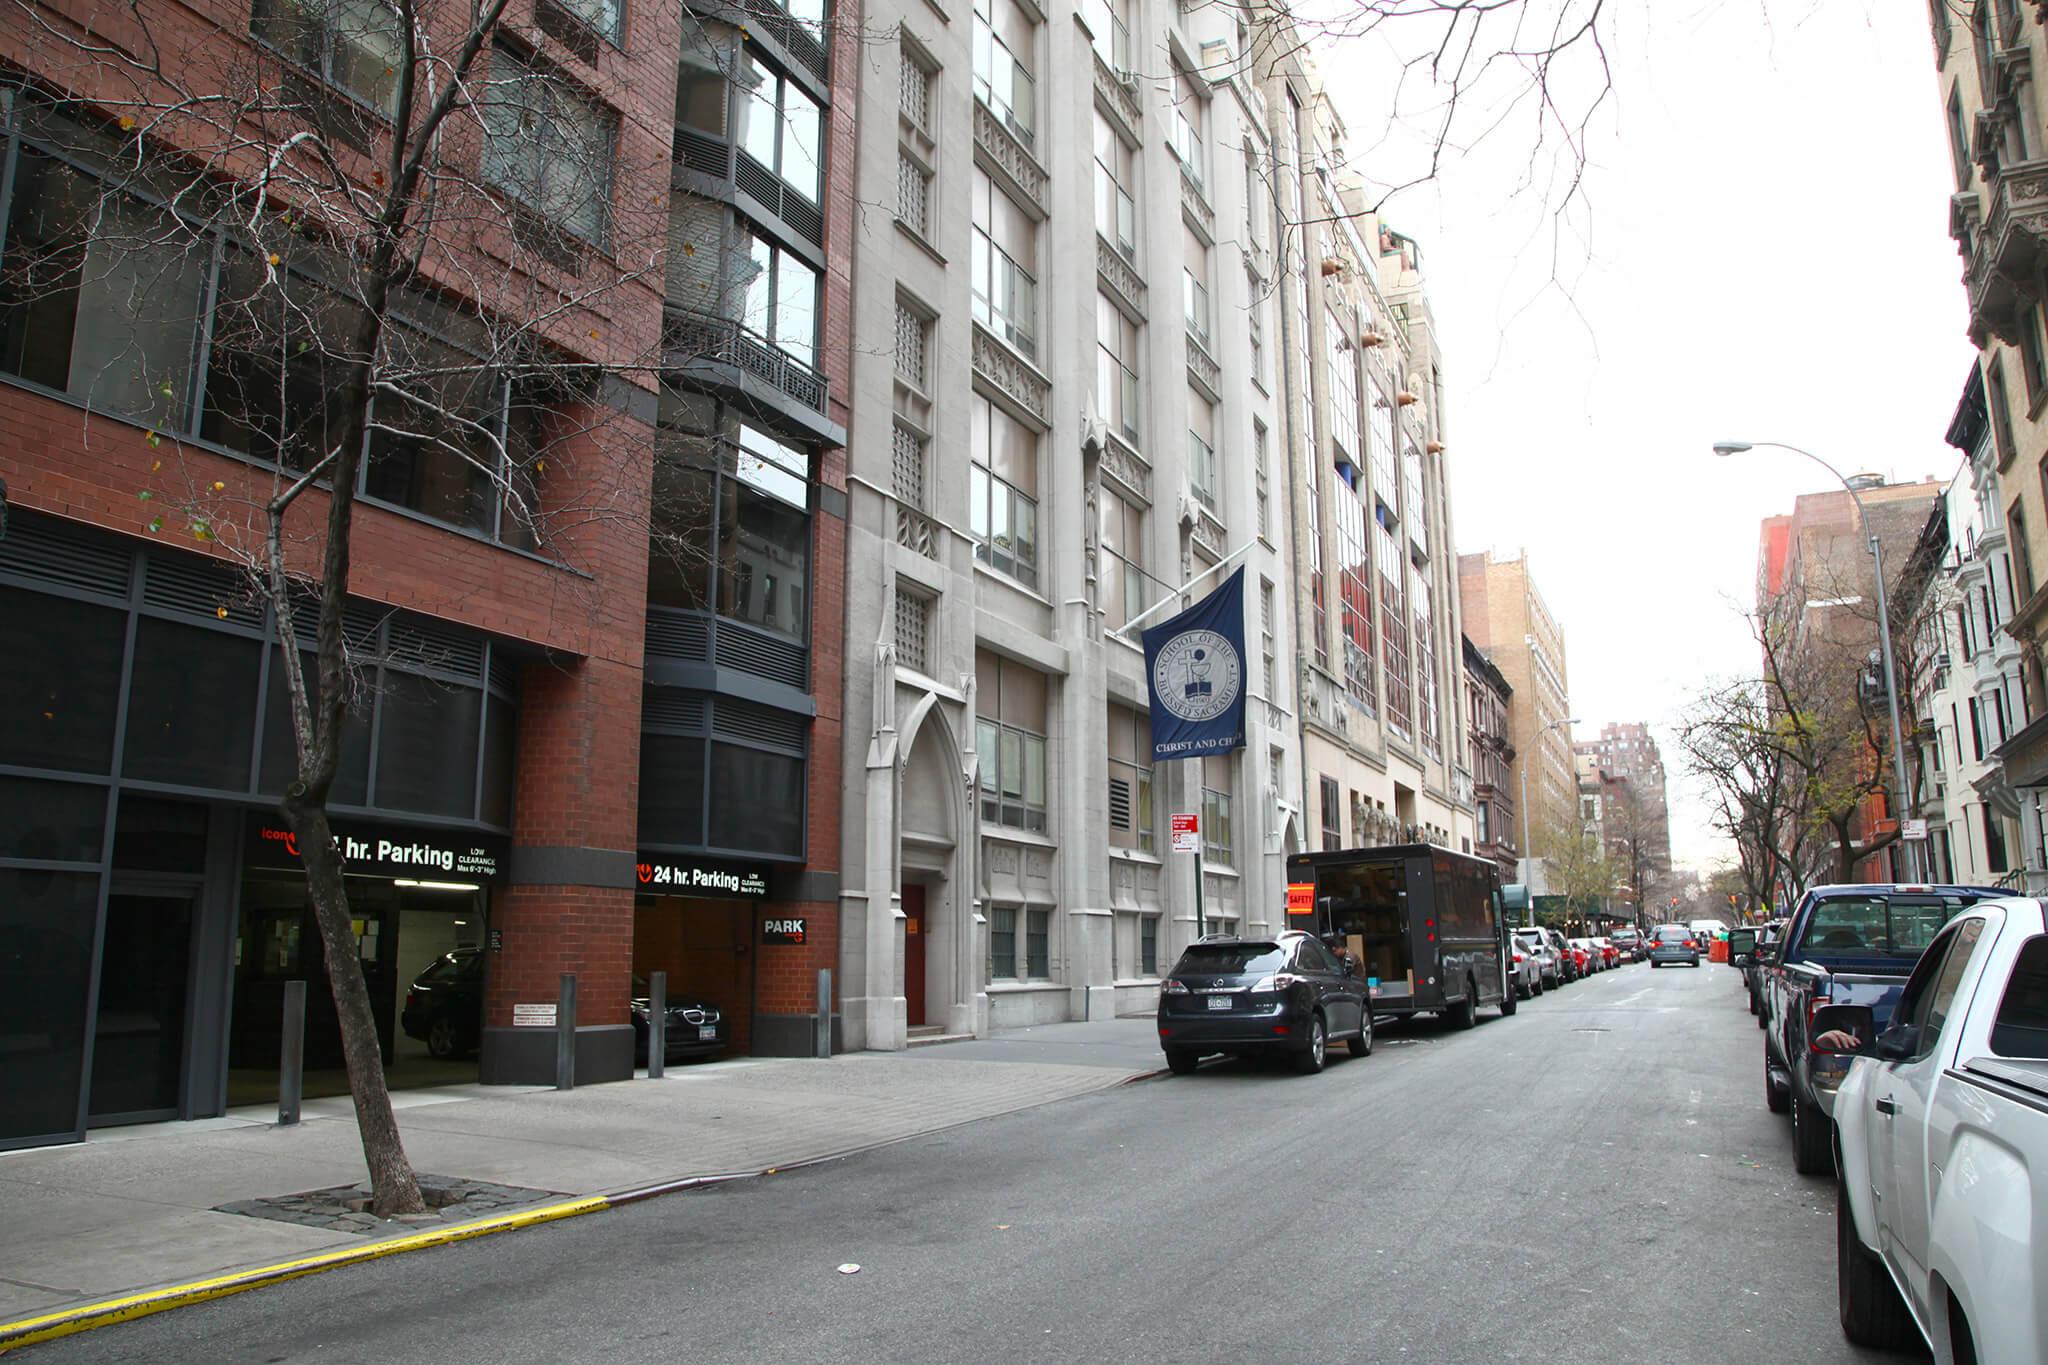 Parking Near 152 W 71st St New York New York New York New York